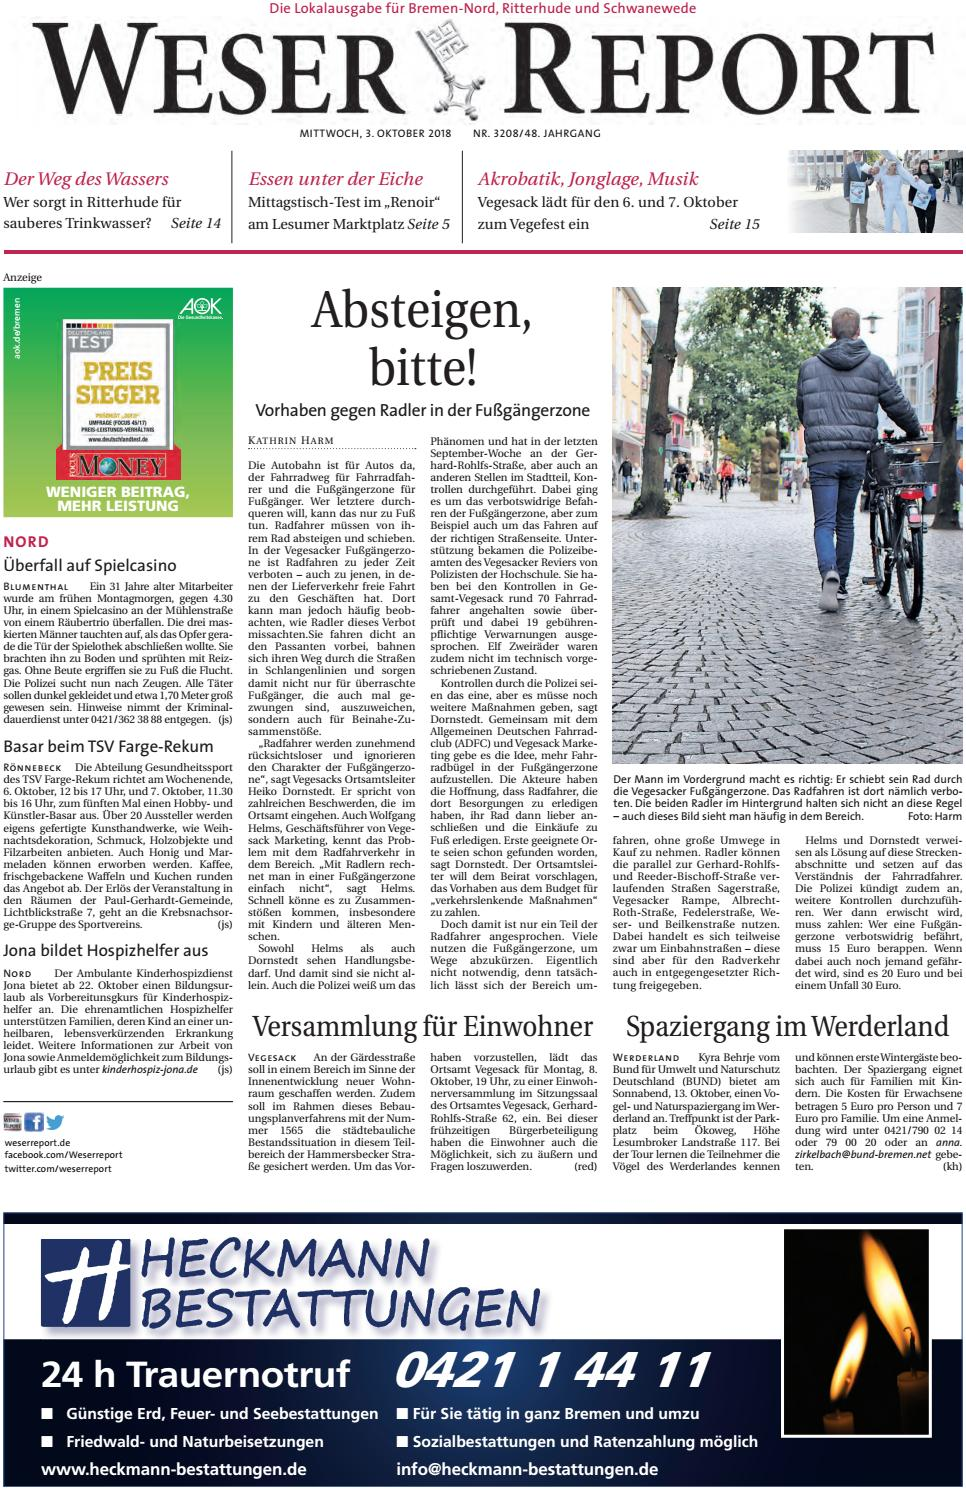 Weser Report - Nord vom 03.10.2018 by KPS Verlagsgesellschaft mbH - issuu